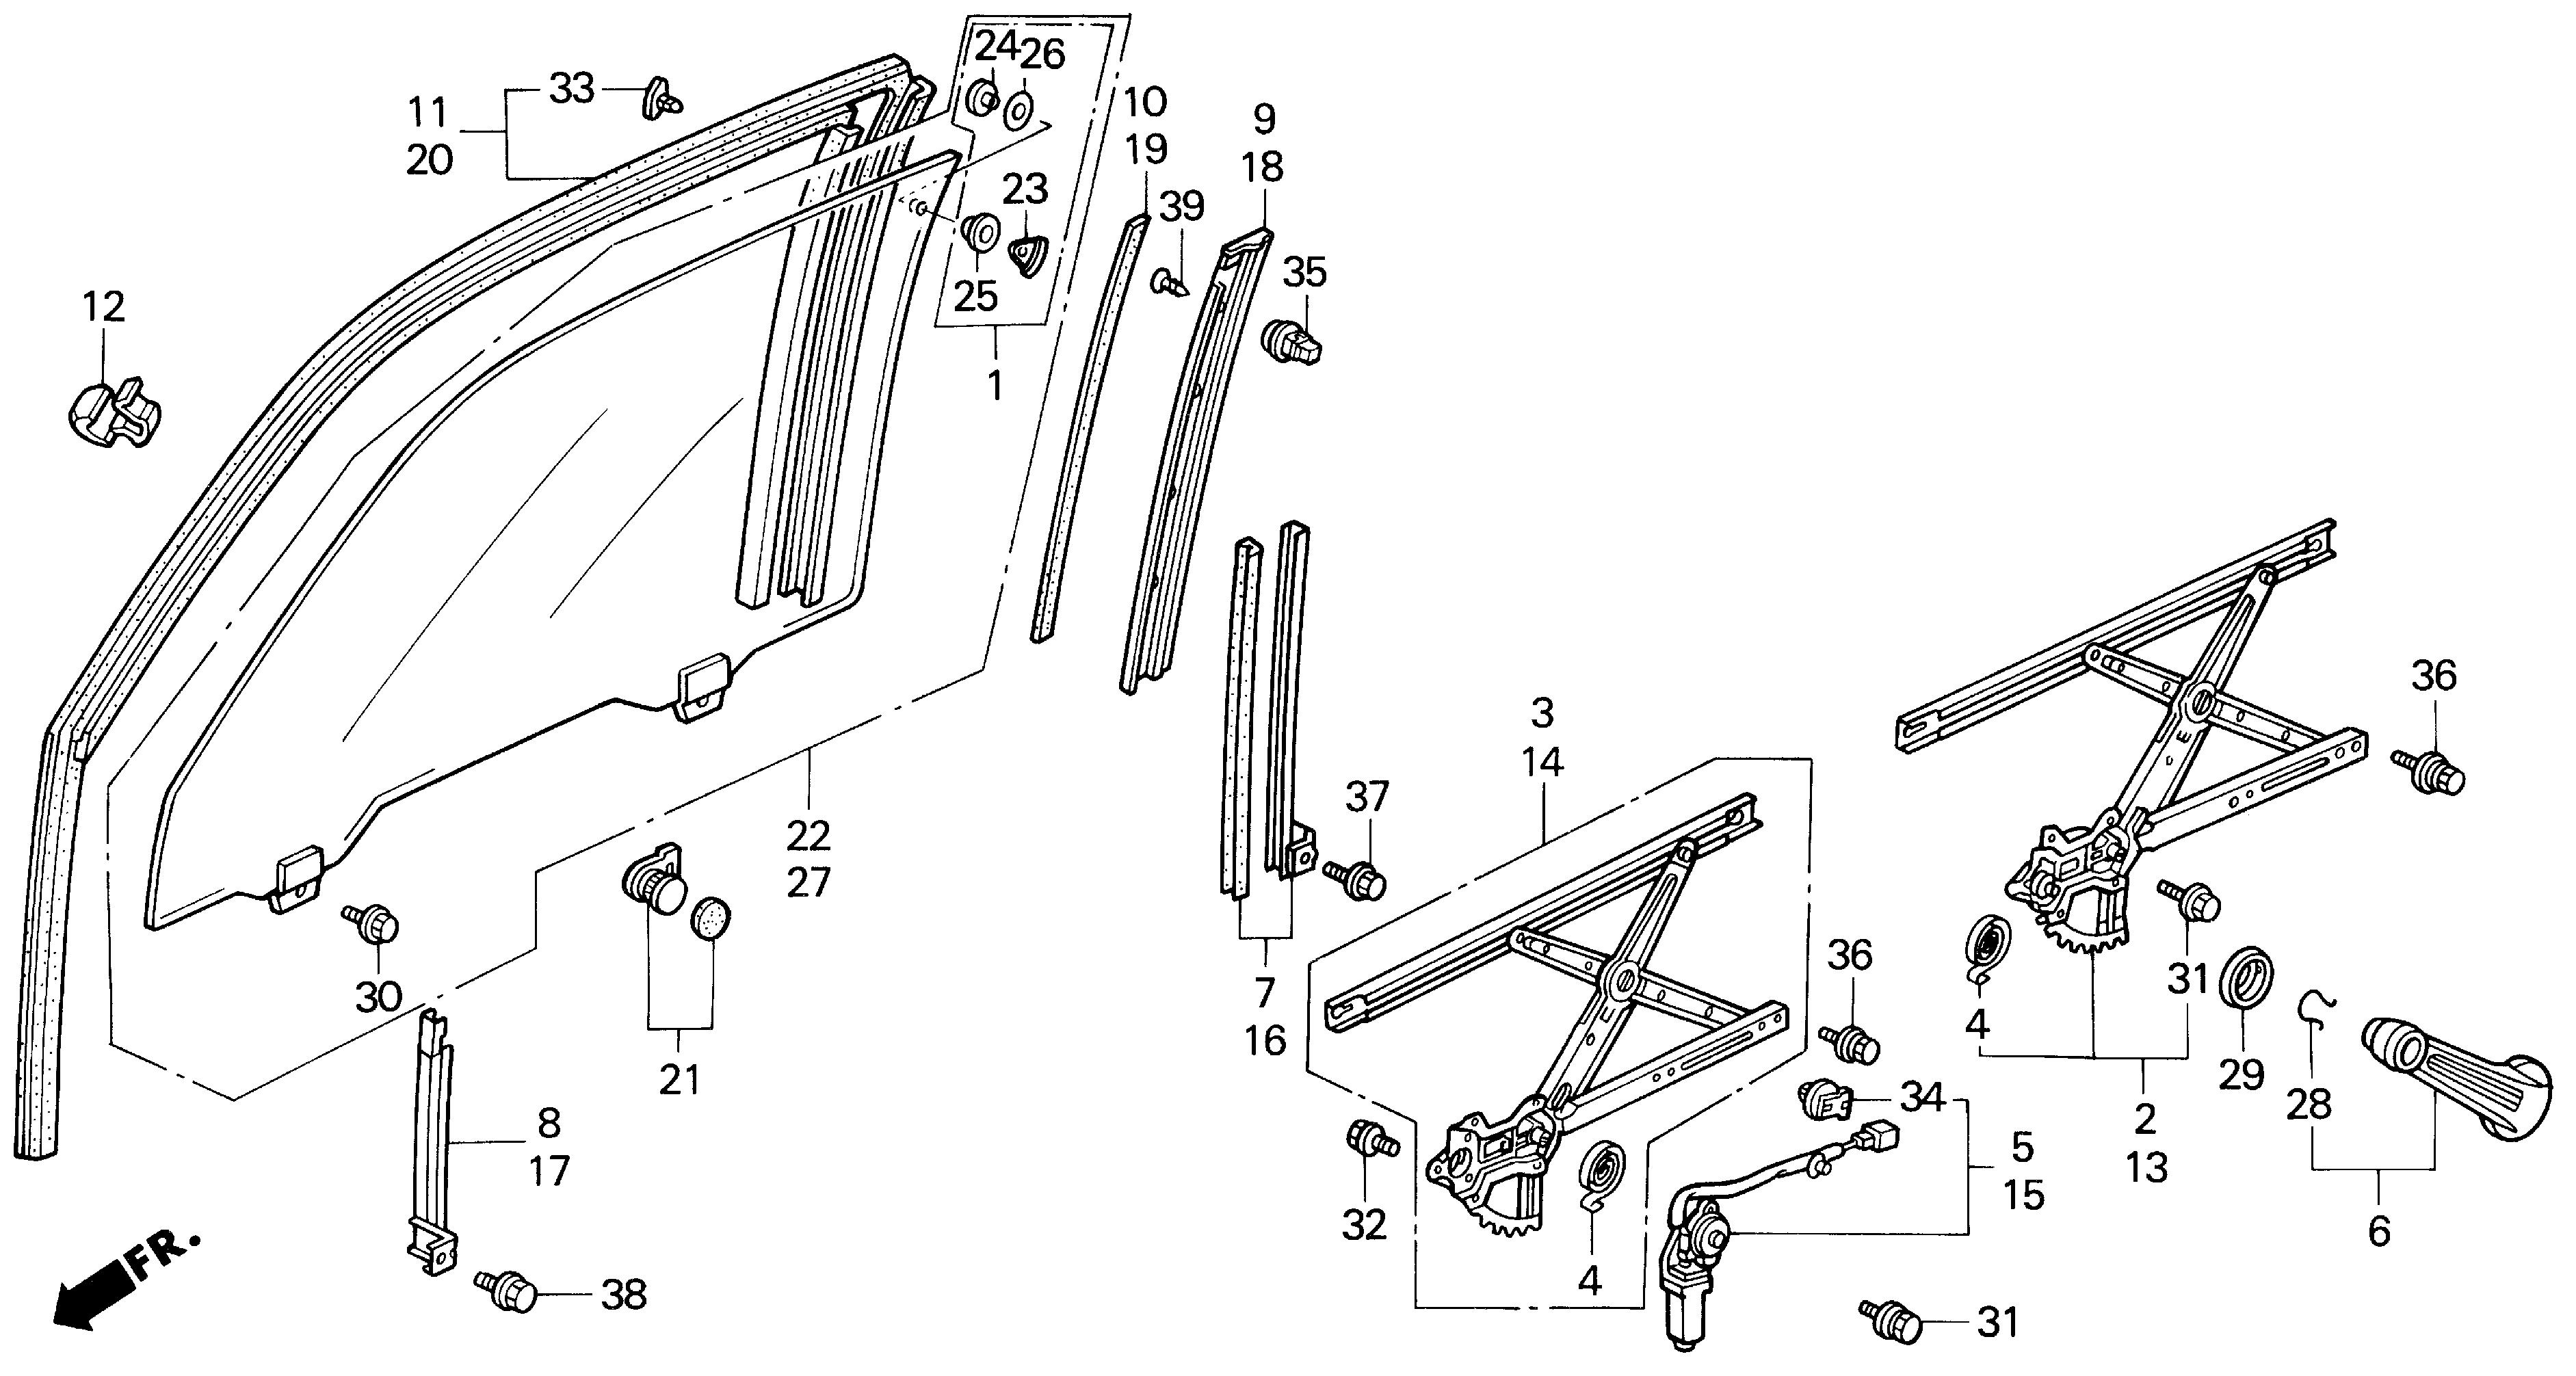 1993 honda accord parts diagram 2000 ford f150 radio wiring 92 window pin thingy pic tech